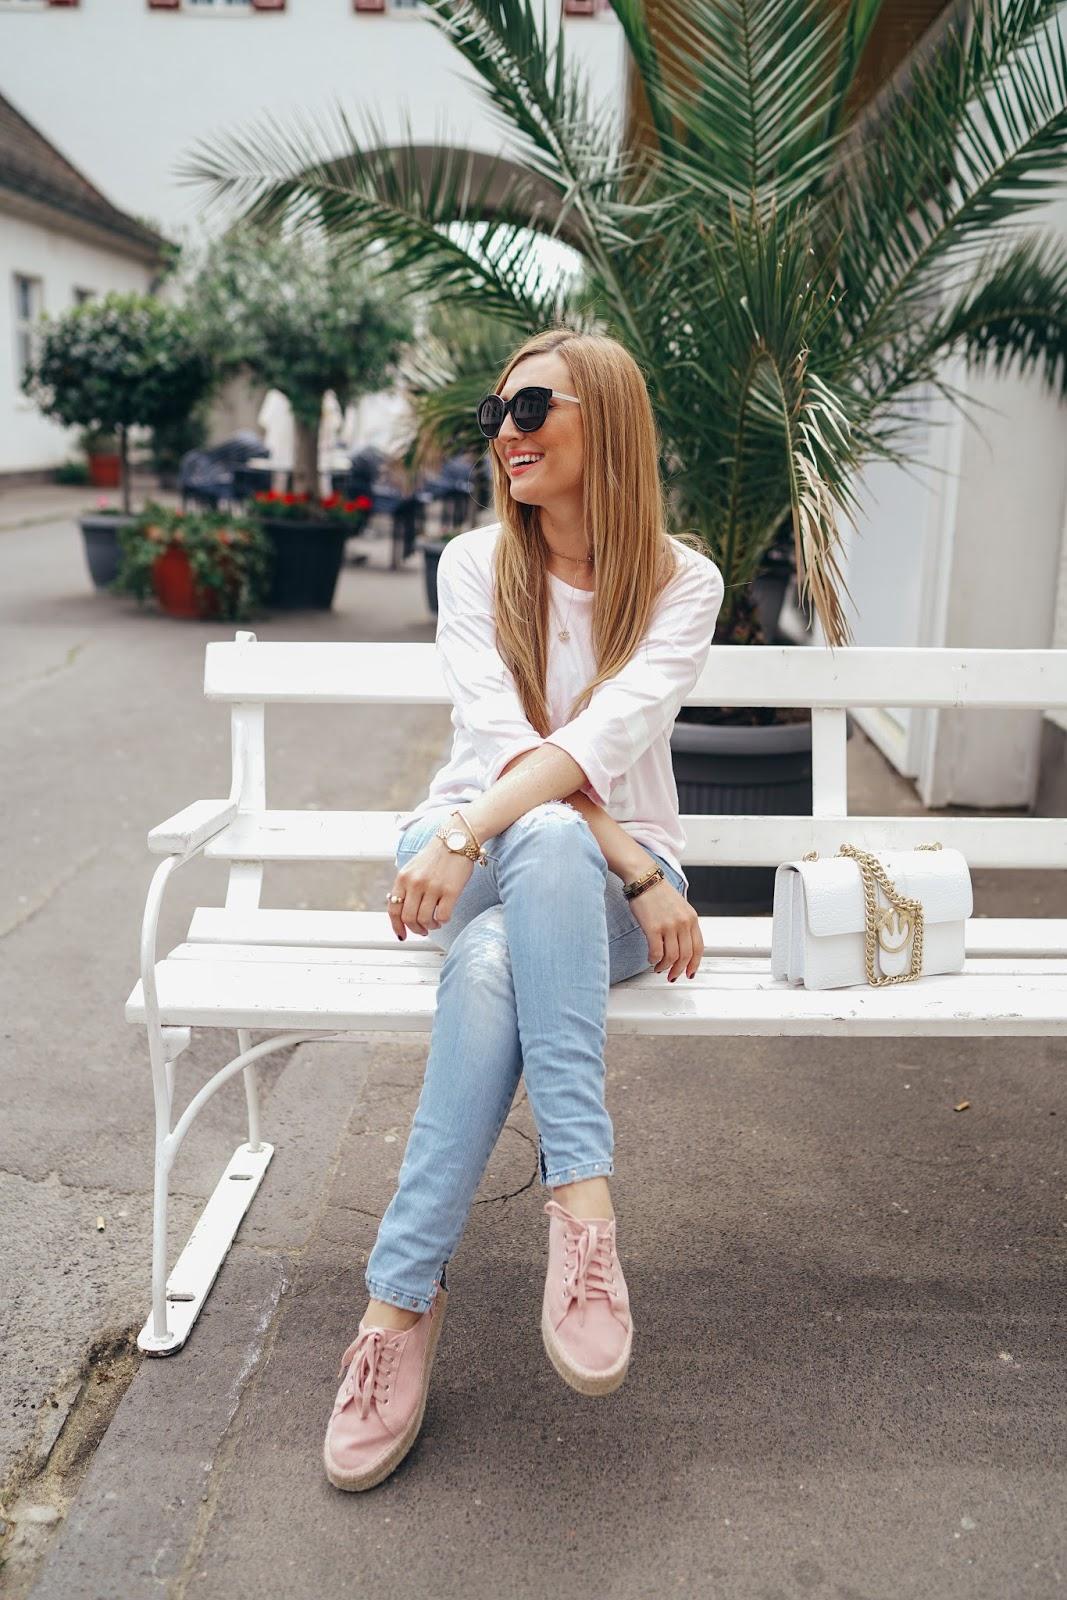 Collage-Look-Plateau-Schuhe-Plateu-Sneaker-kombinieren-bloggerstyle-fashionstylebyjohanna-blogger-aus-frankfurt-frankfurt-fashionblogger-beautyblogger